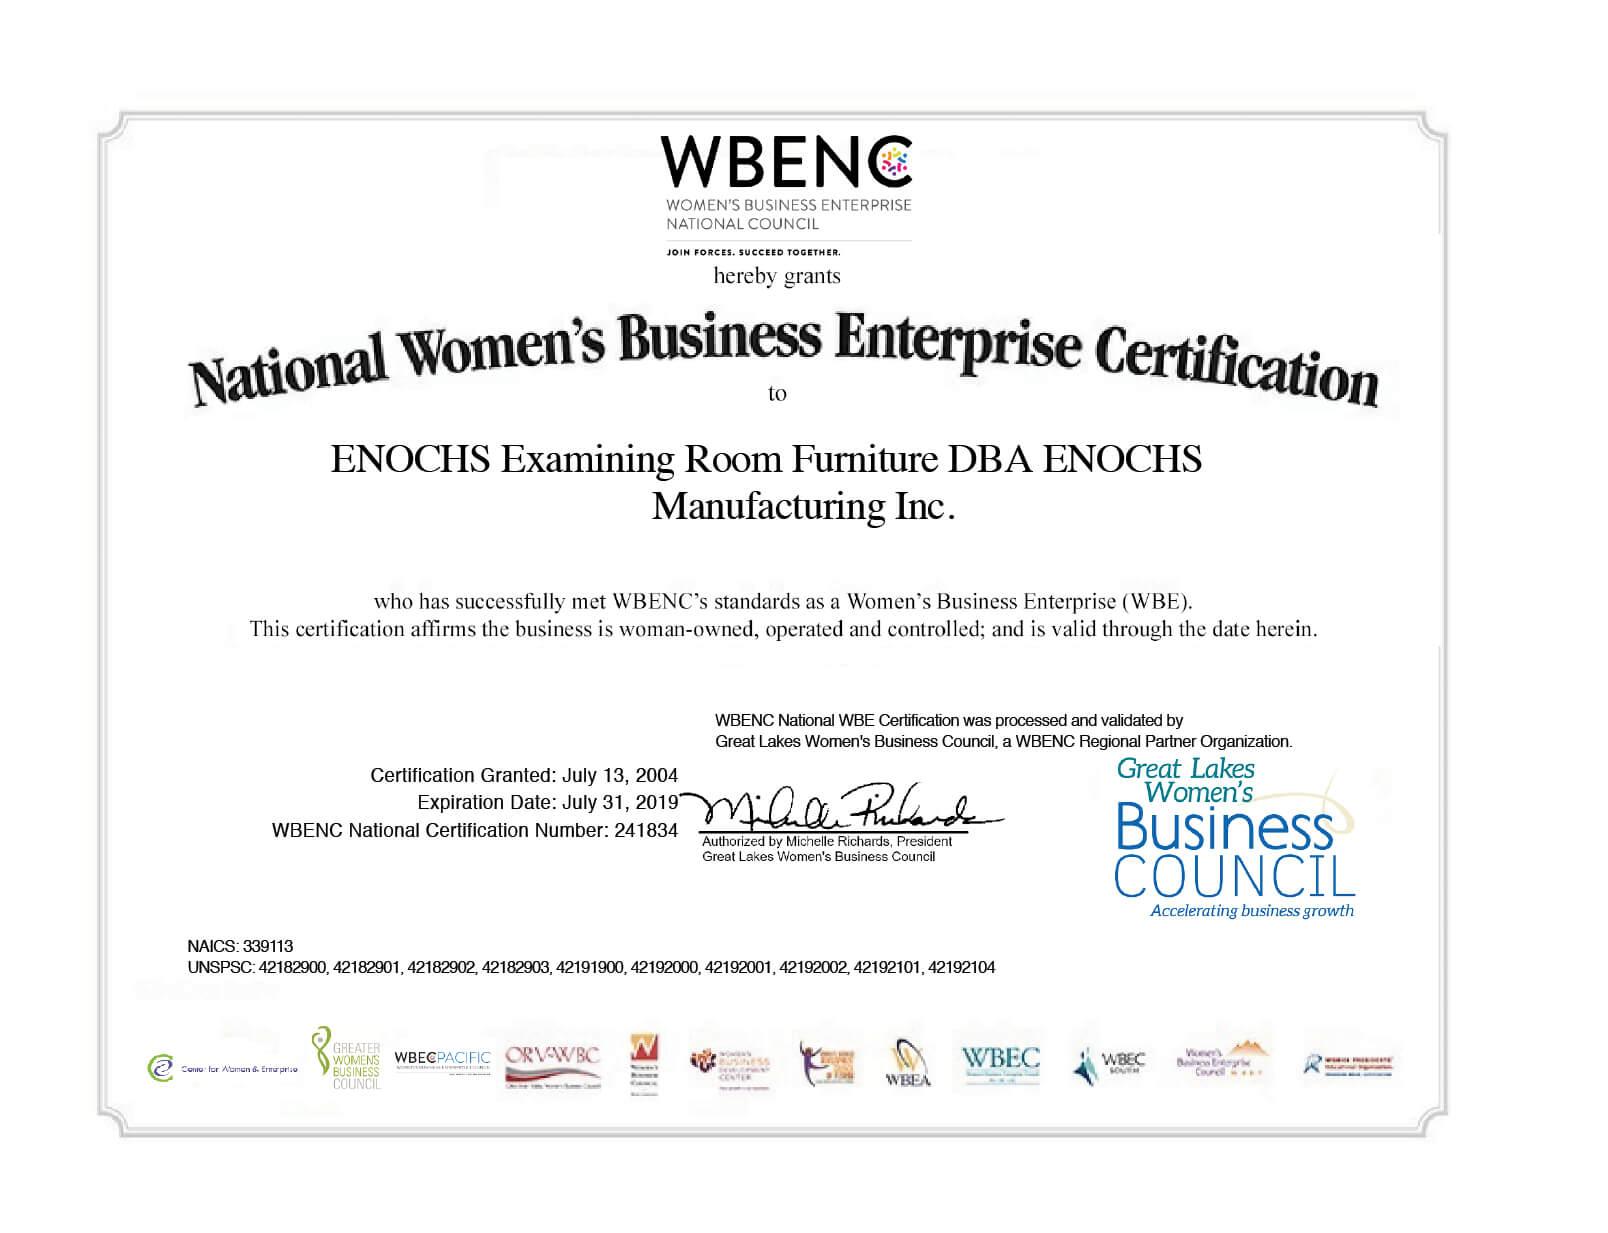 WBENC-2018-19-Certificate.jpg